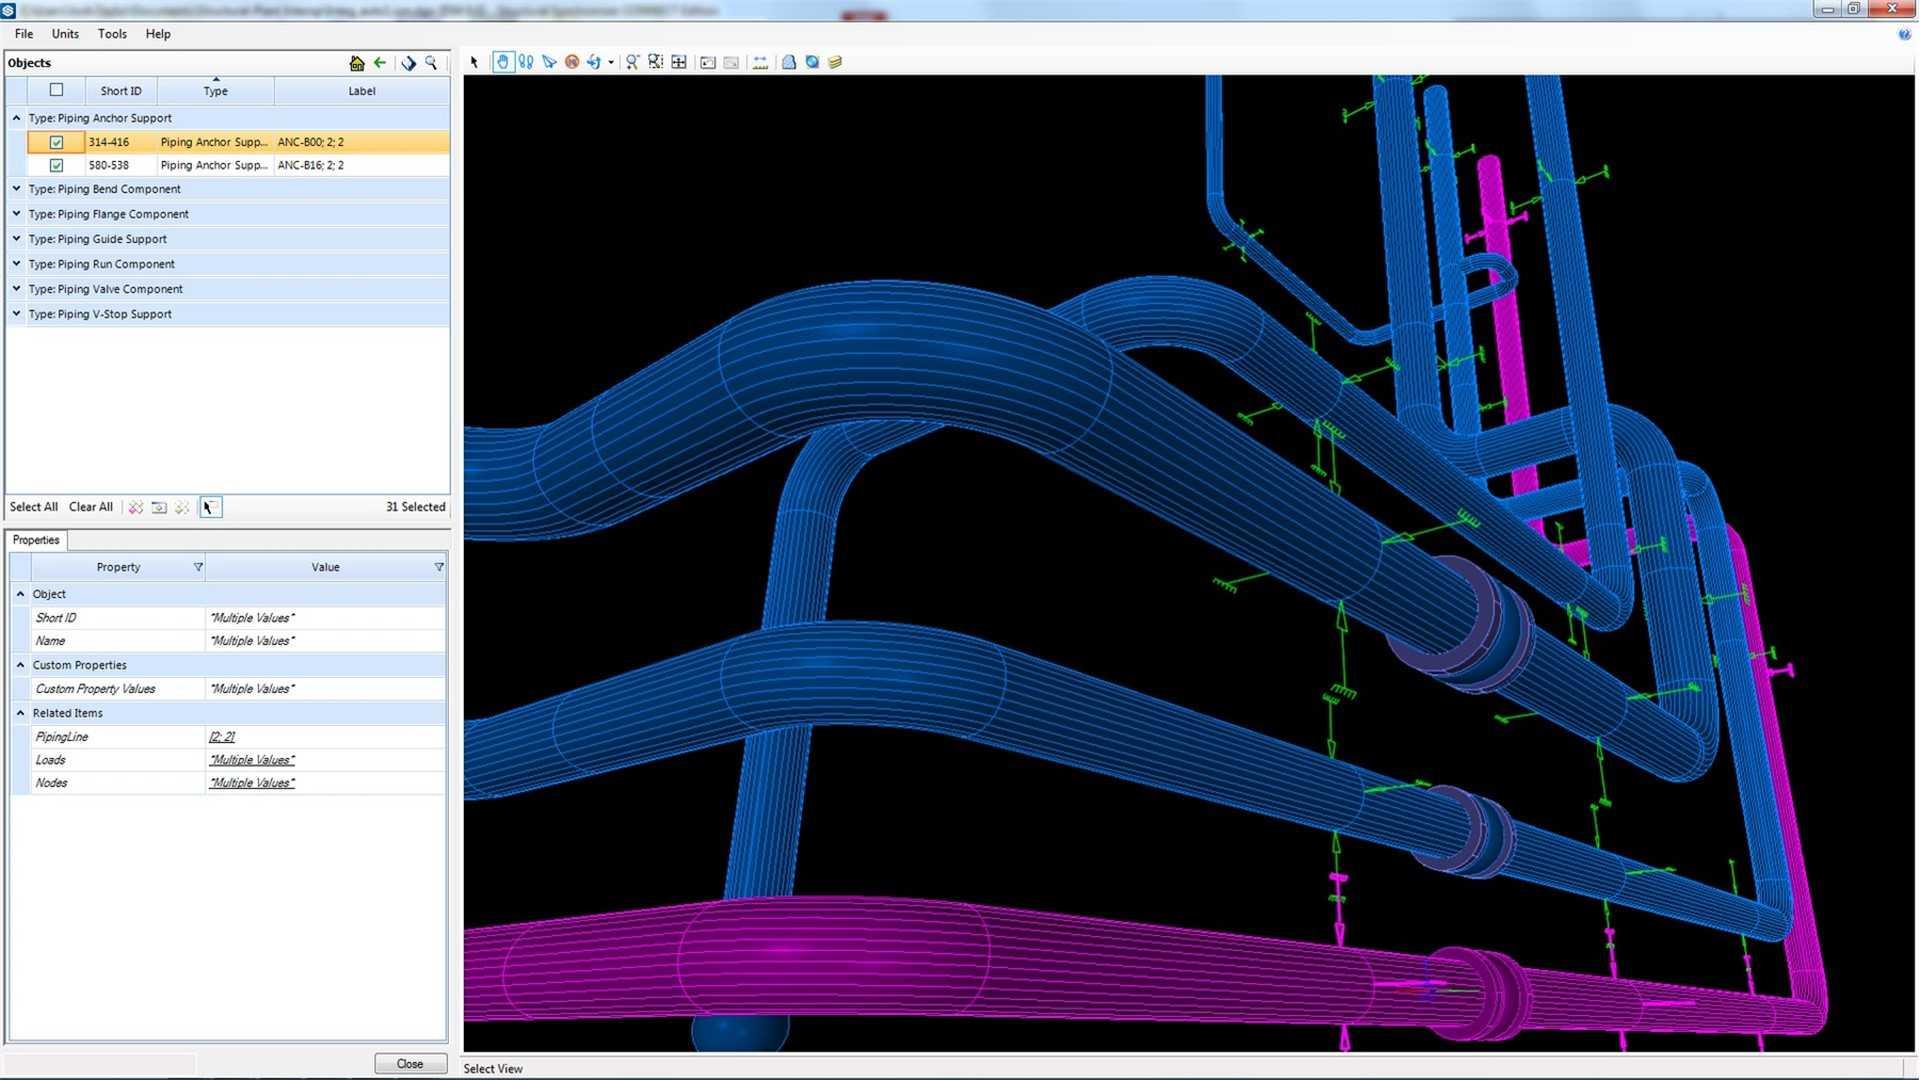 Mechanical Engineering Spreadsheets Free Download For 10 Inspirational Mechanical Engineering Design Spreadsheet Toolkit